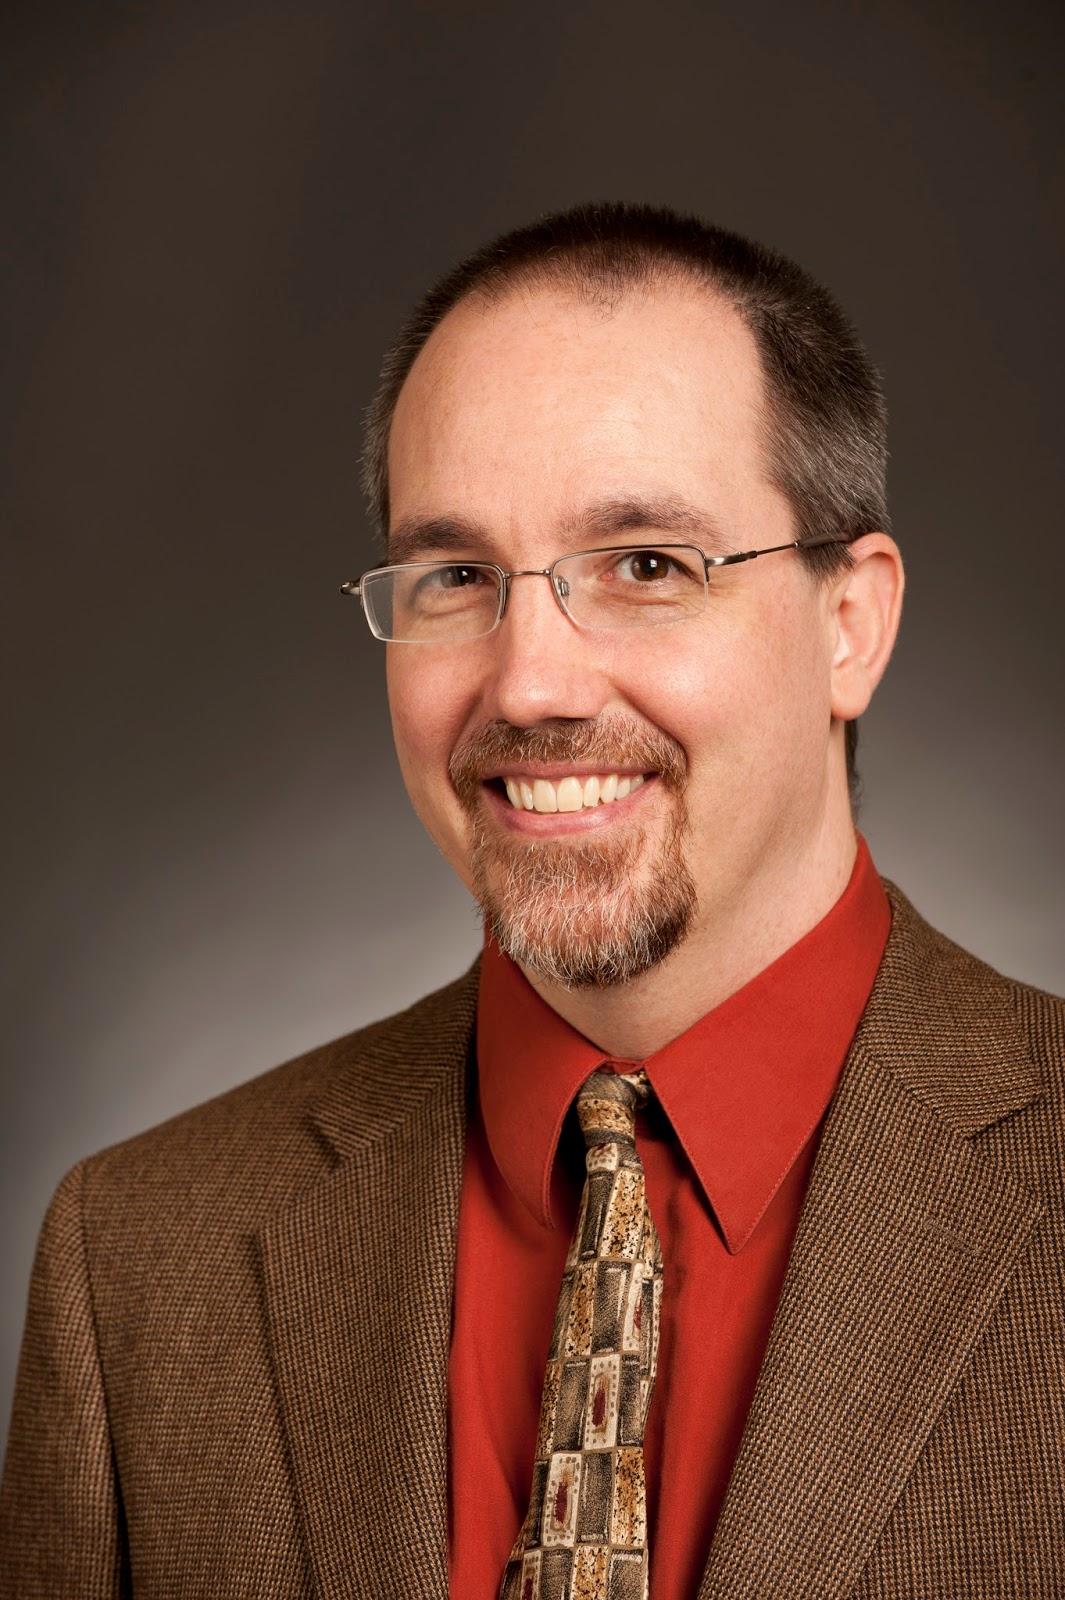 Dr. Richard W. Sears, mindfulness